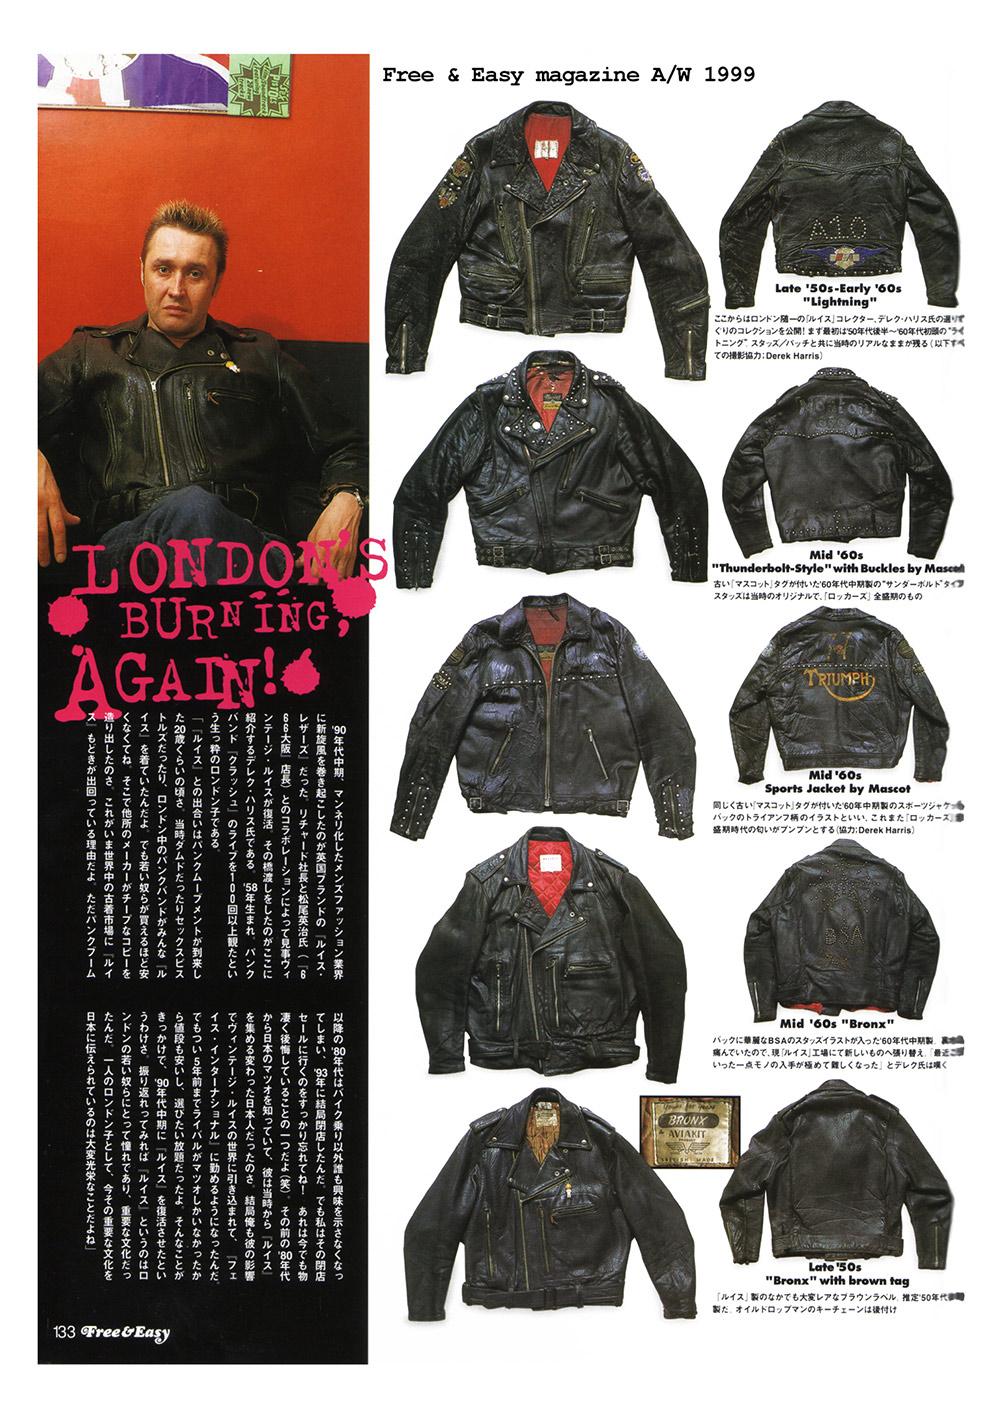 Free-&-Easy-magazine-2000-B